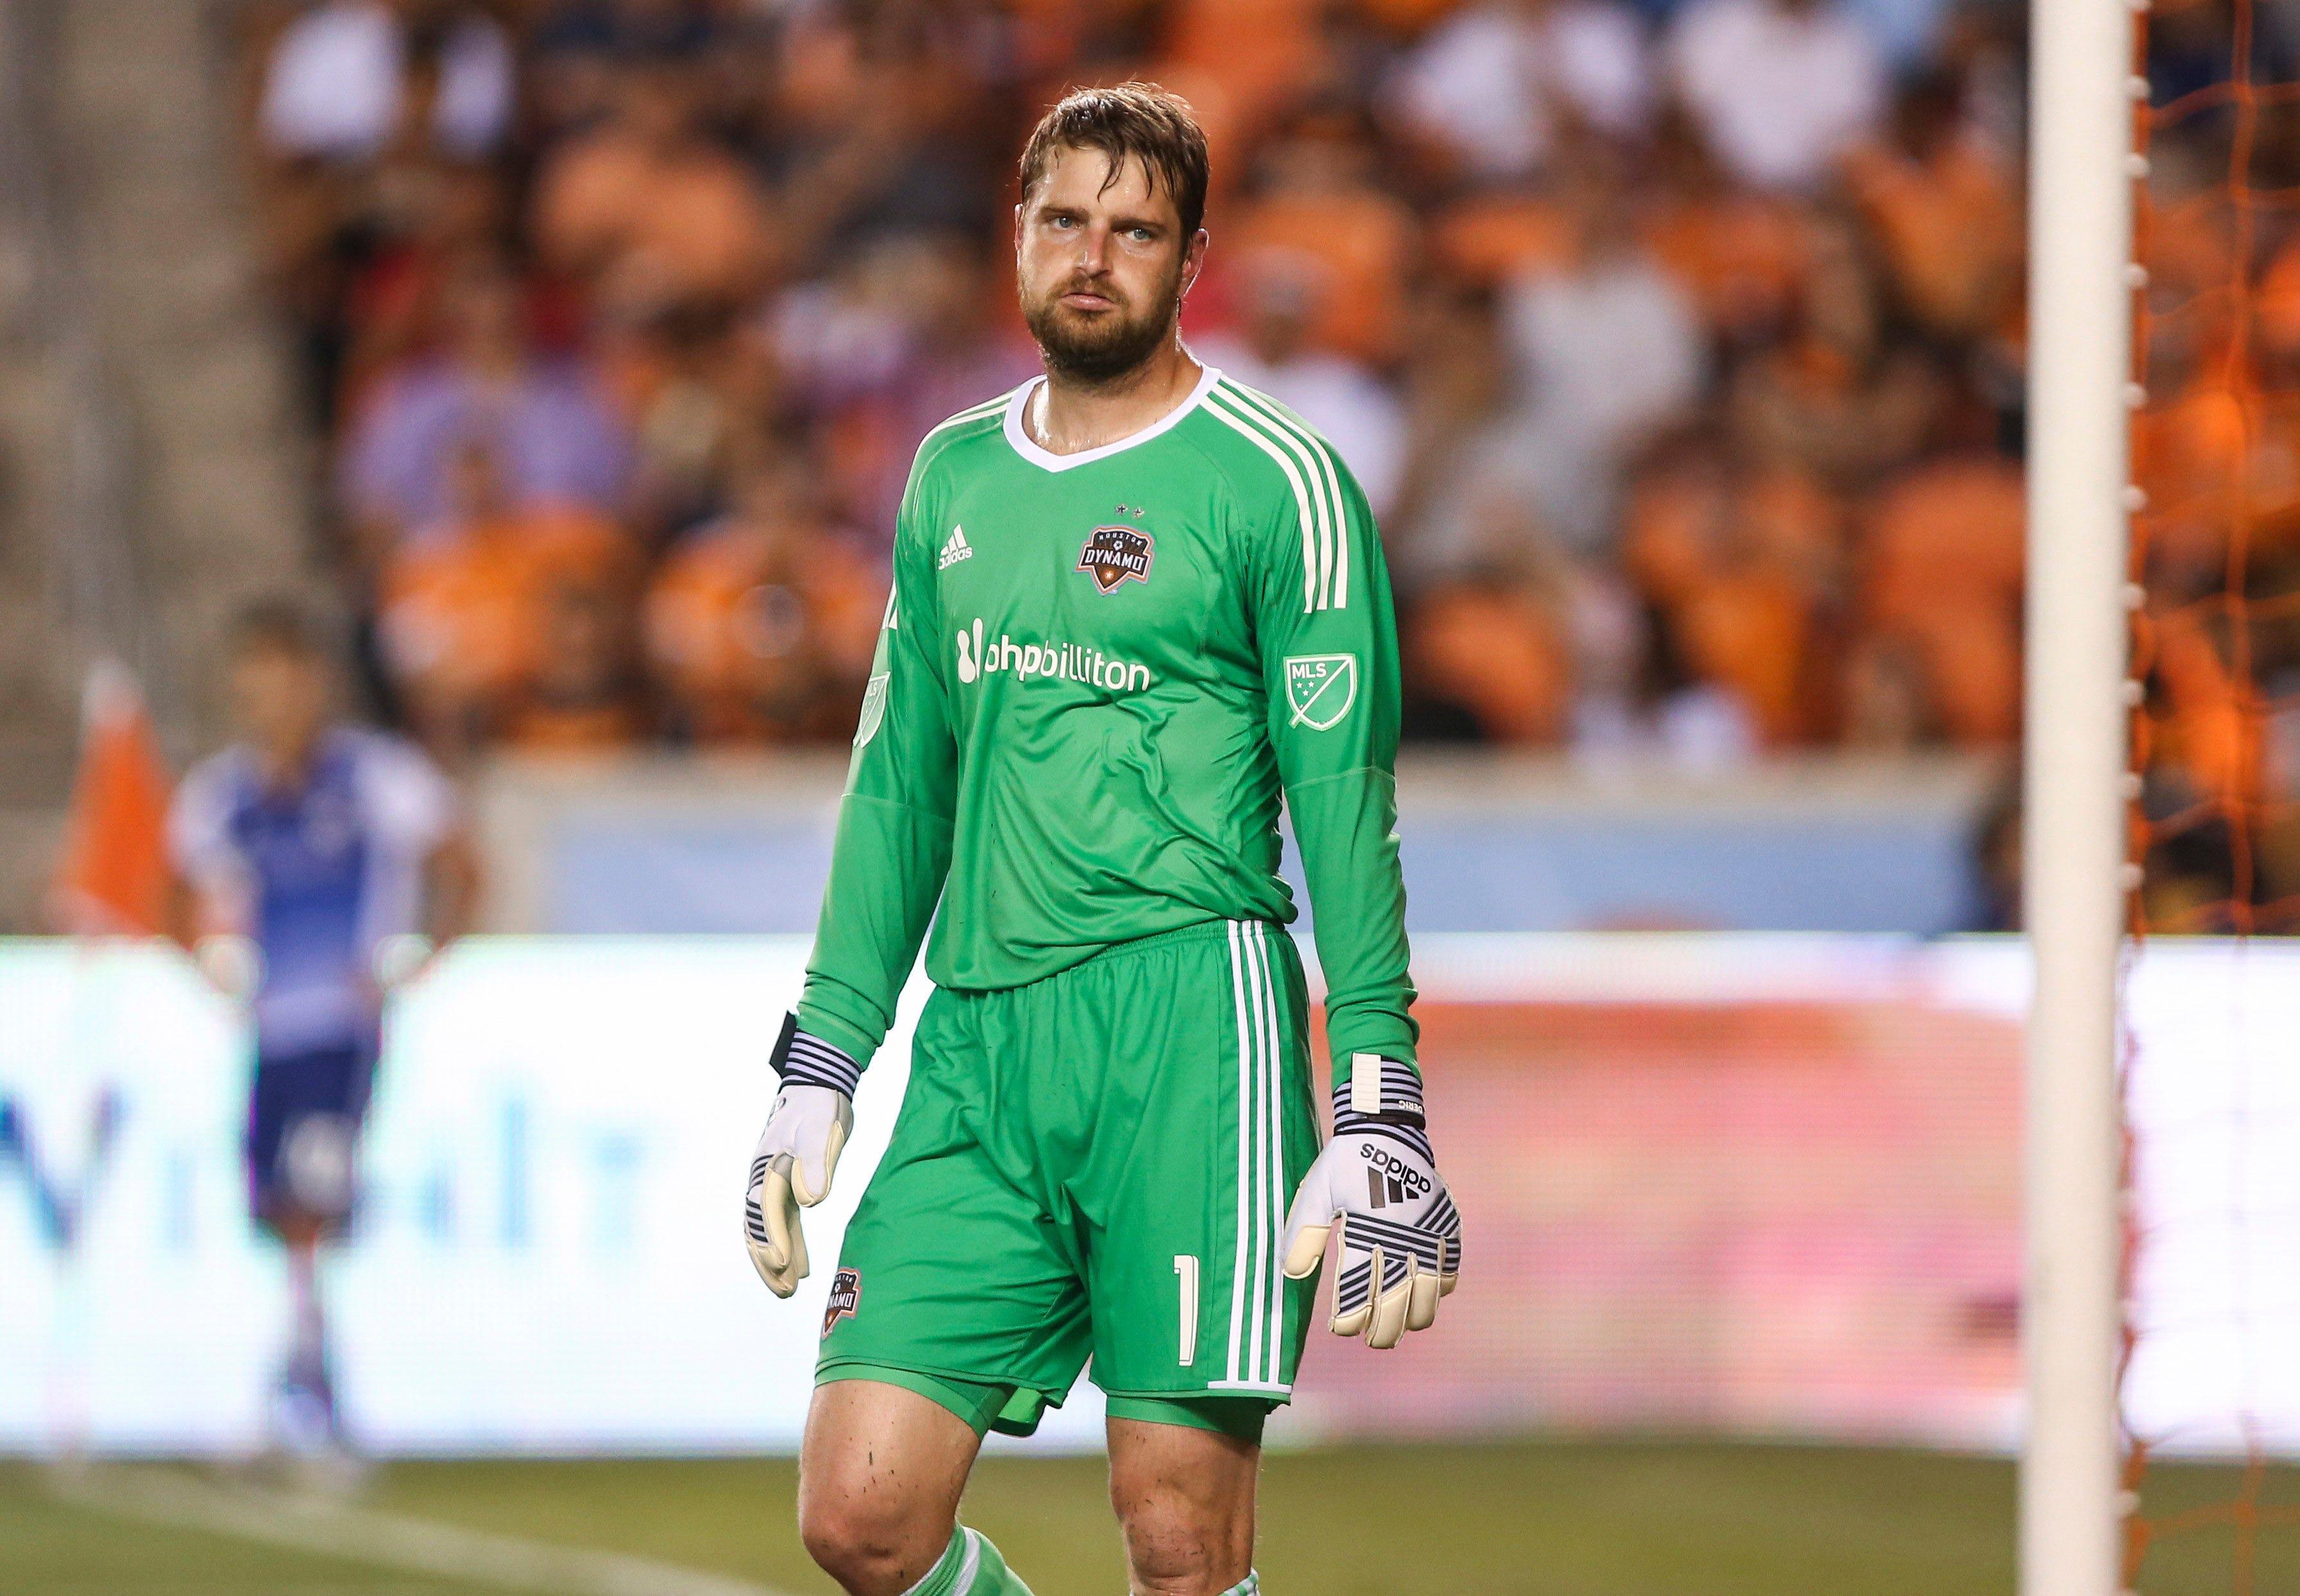 Houston Dynamo goalkeeper Tyler Deric suspended after assault arrest